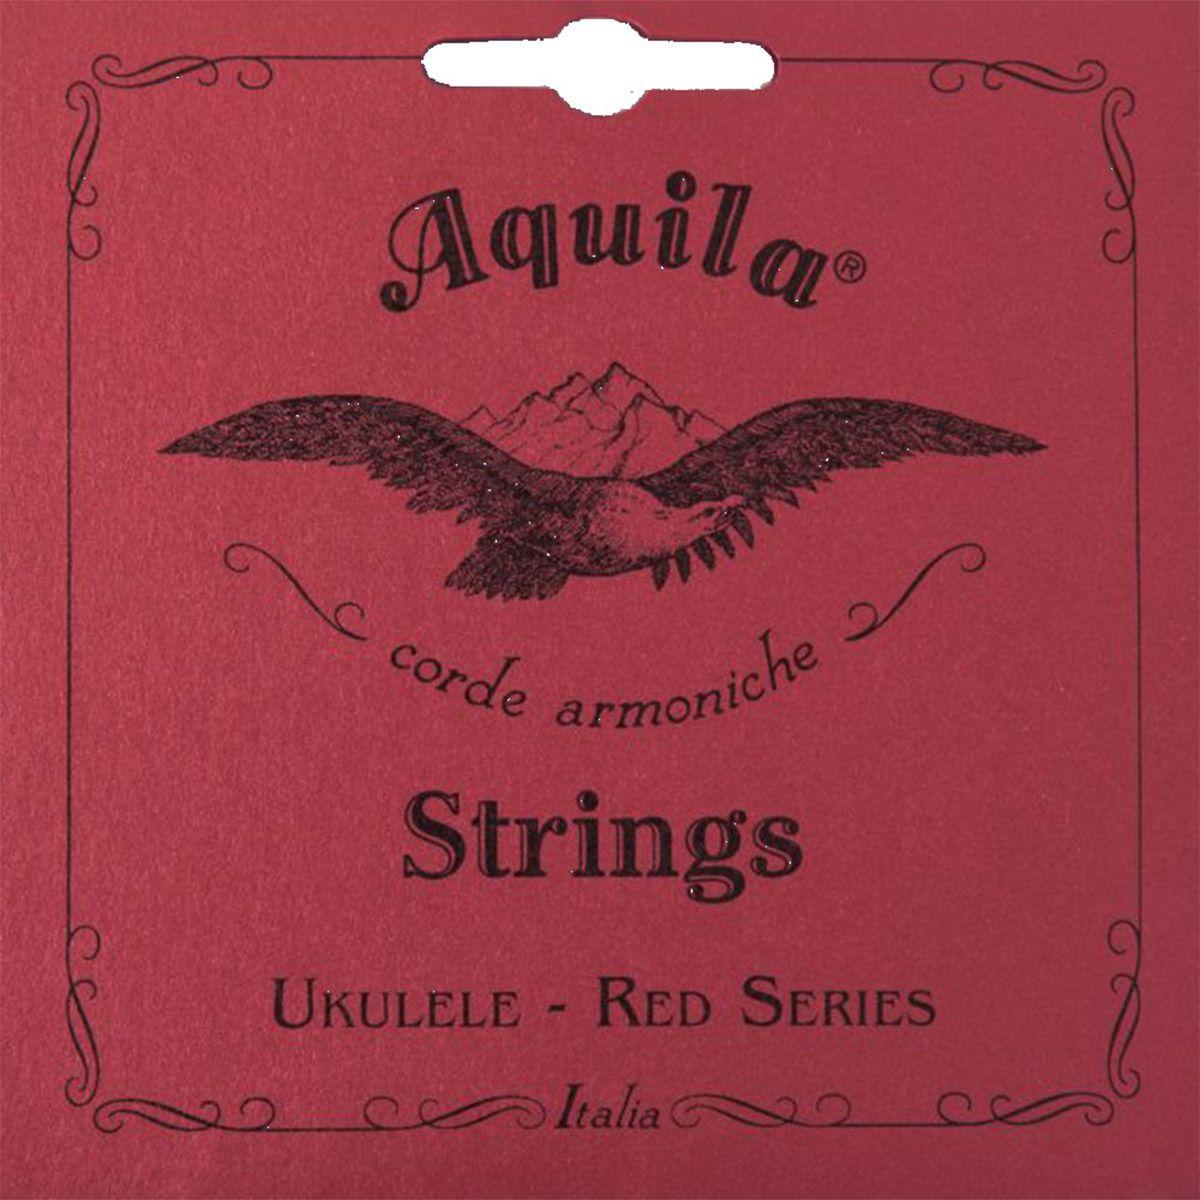 Encordoamento Aquila 83U Red Series High G Ukulele Soprano